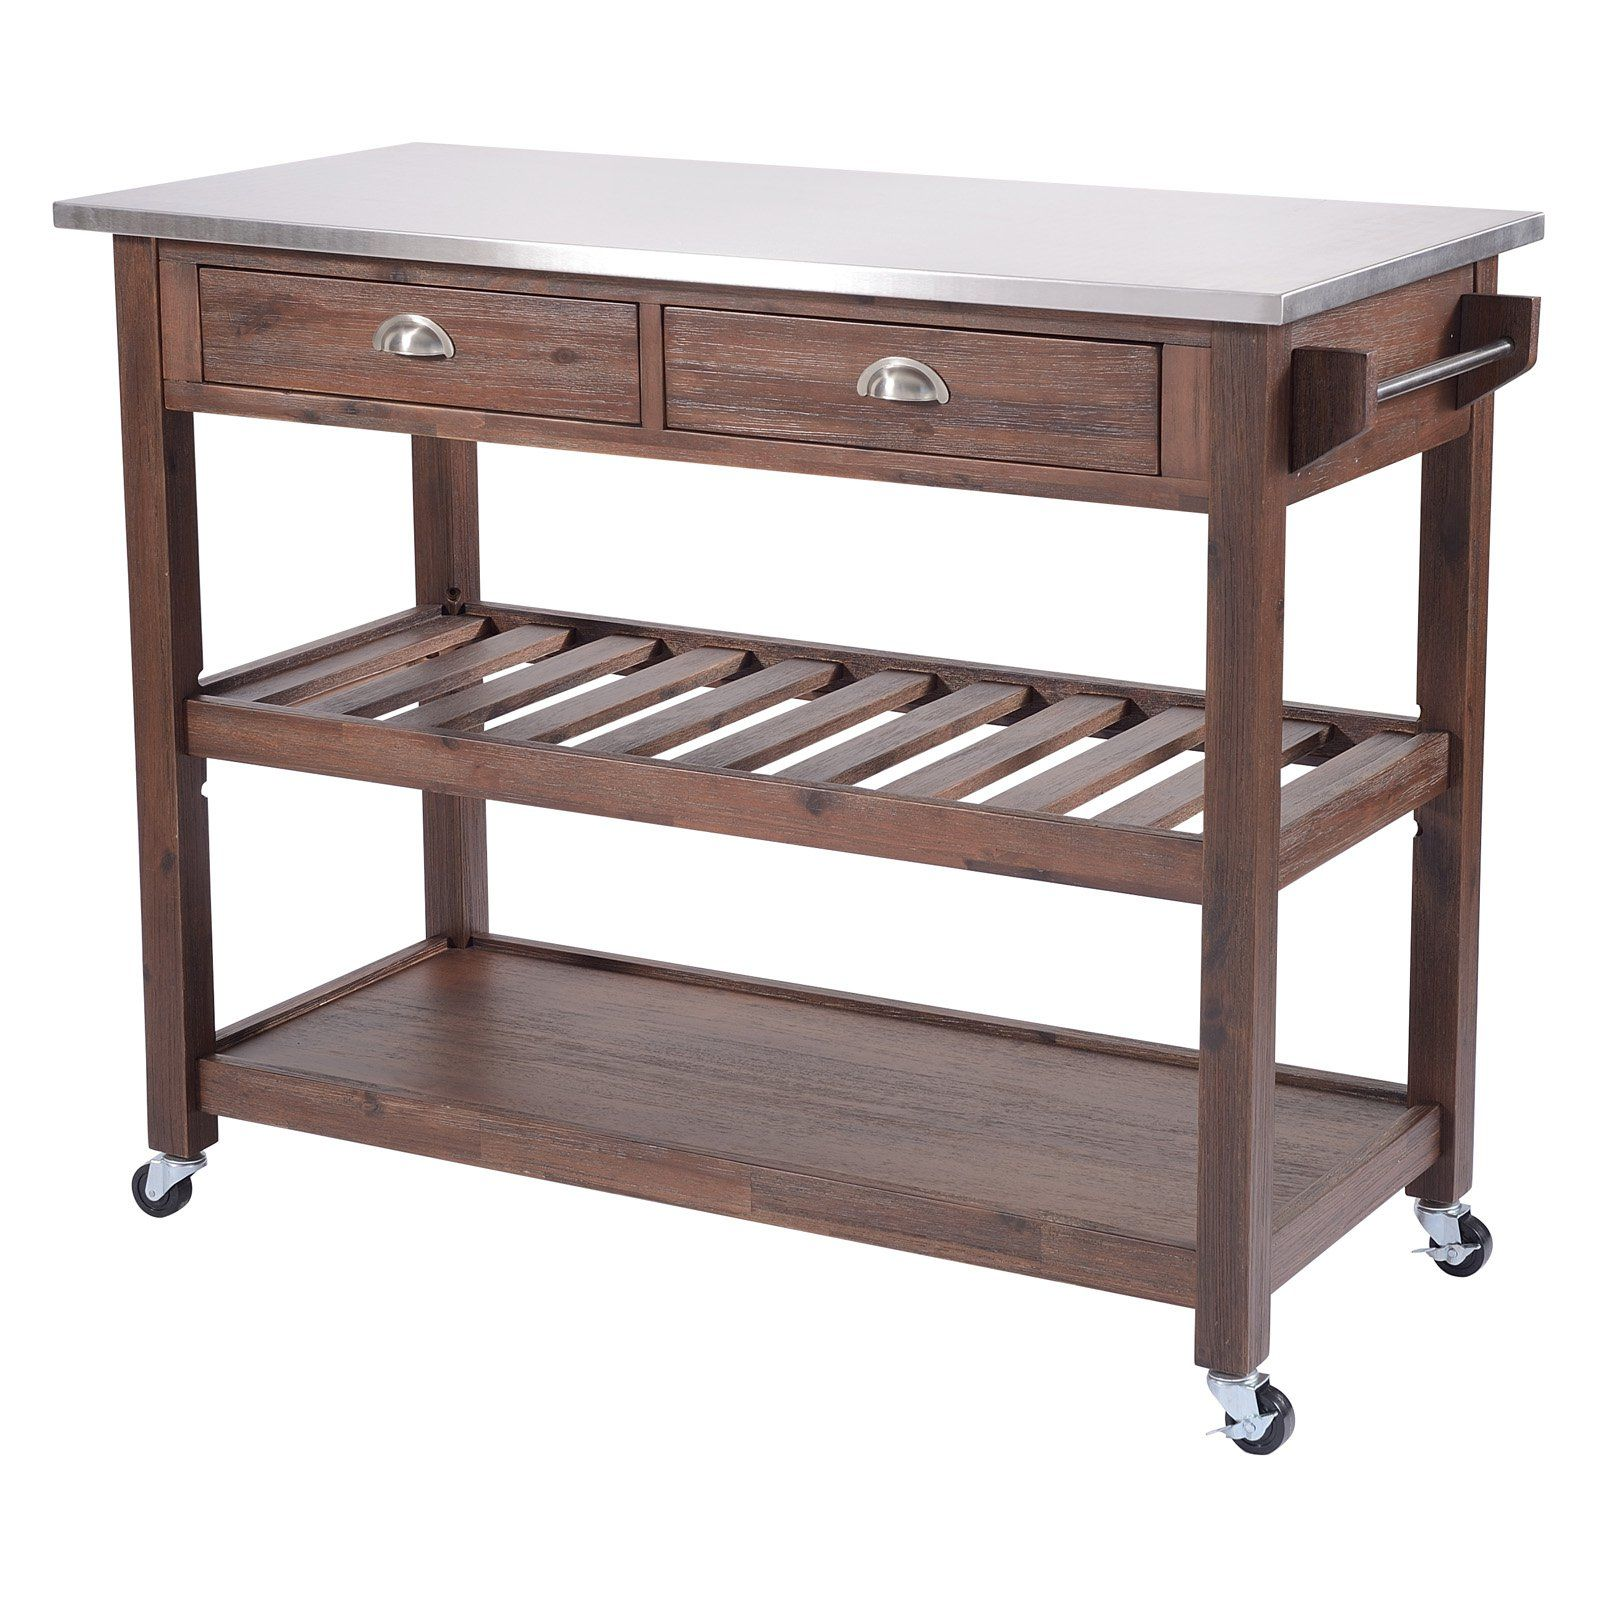 Sonoma Wire Brush Rustic Finish Kitchen Cart Kitchen Cart Countertops Chestnut Finish